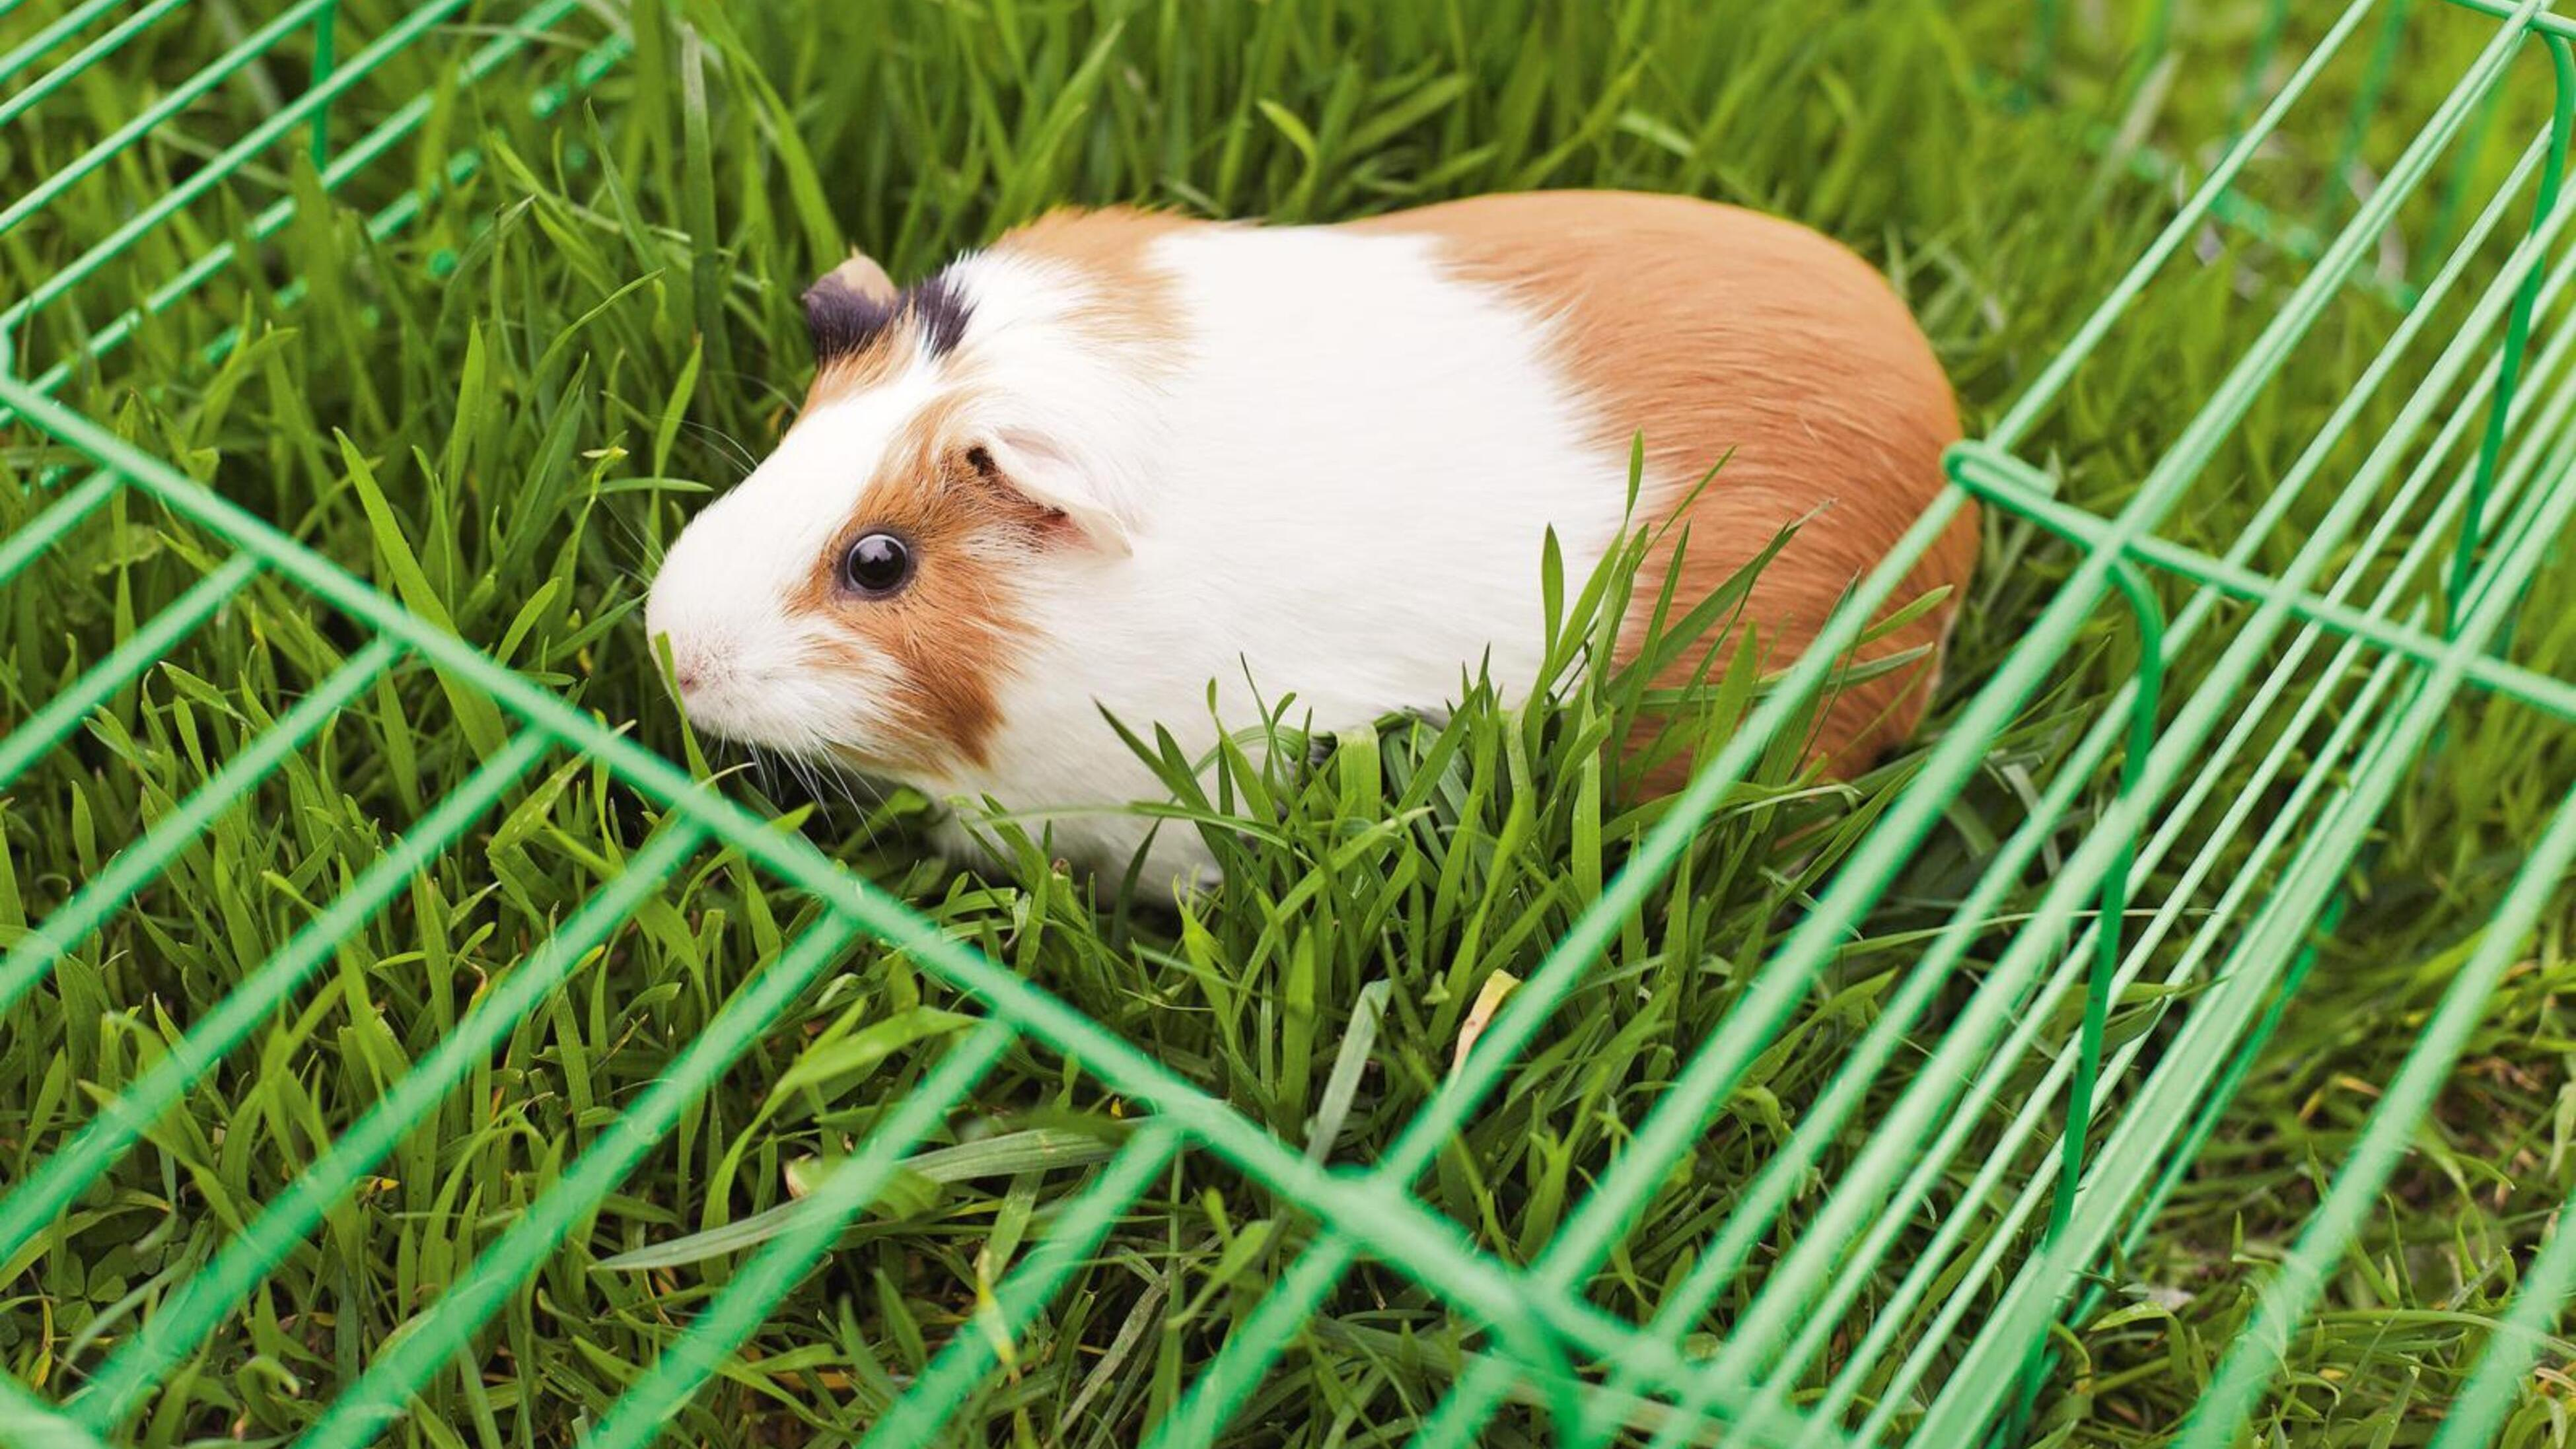 Rabbit on the lawn.